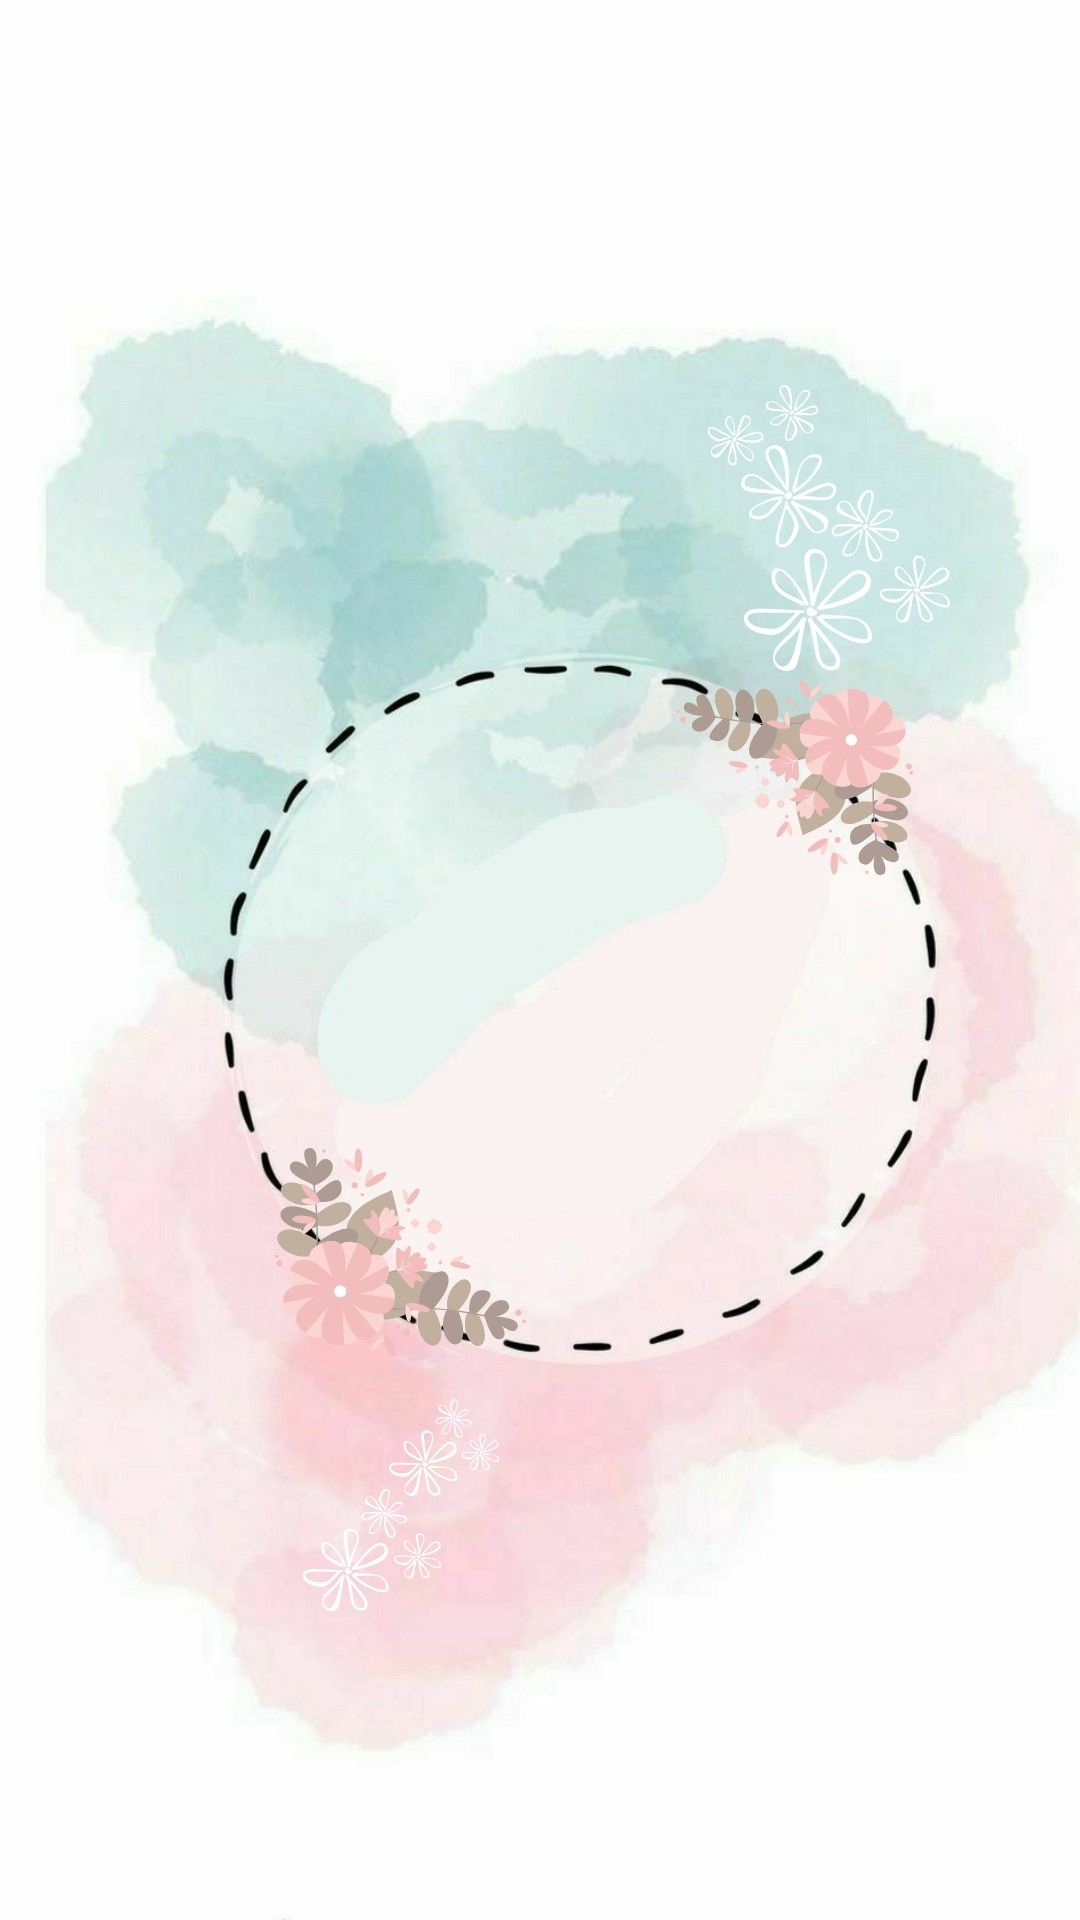 Pin Oleh Koreamaszk Di Insta Latar Belakang Wallpaper Wallpaper Cantik Poster Bunga